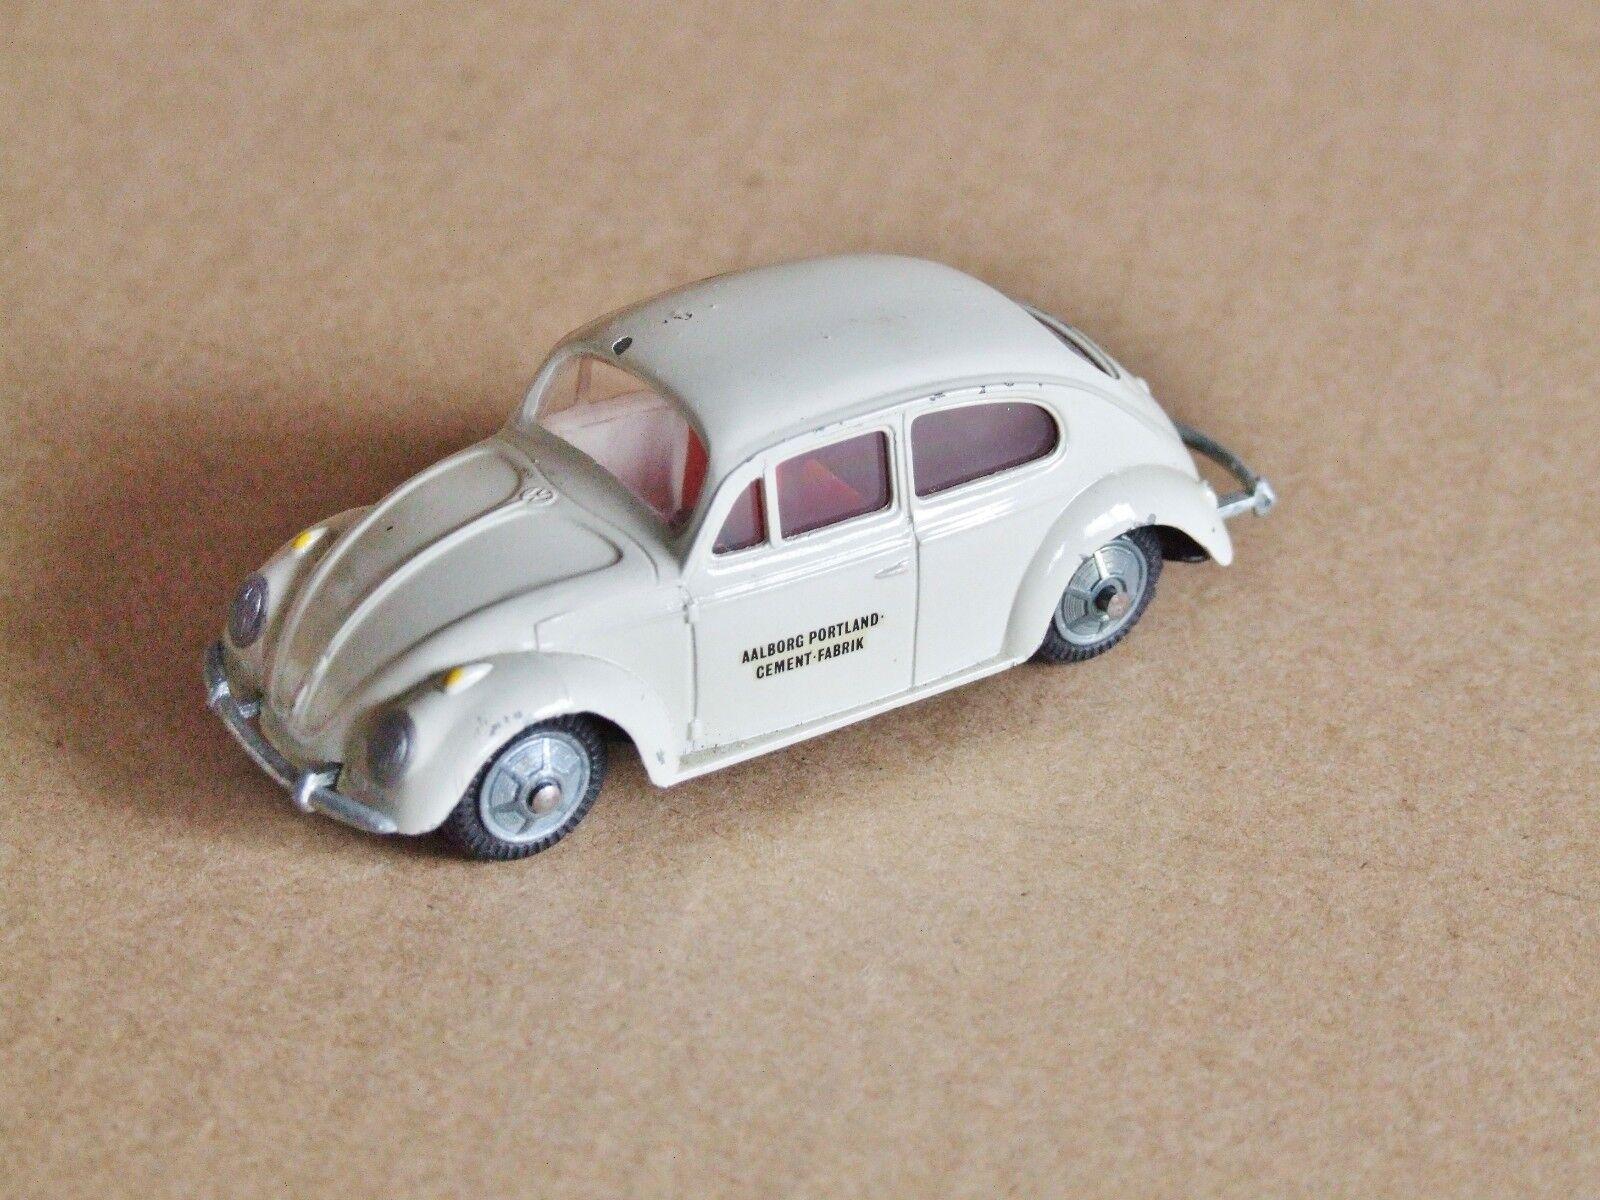 TEKNO 819 Volkswagen Aalborg PORTLAND CEMENT Fabrik-très rare promotionnel